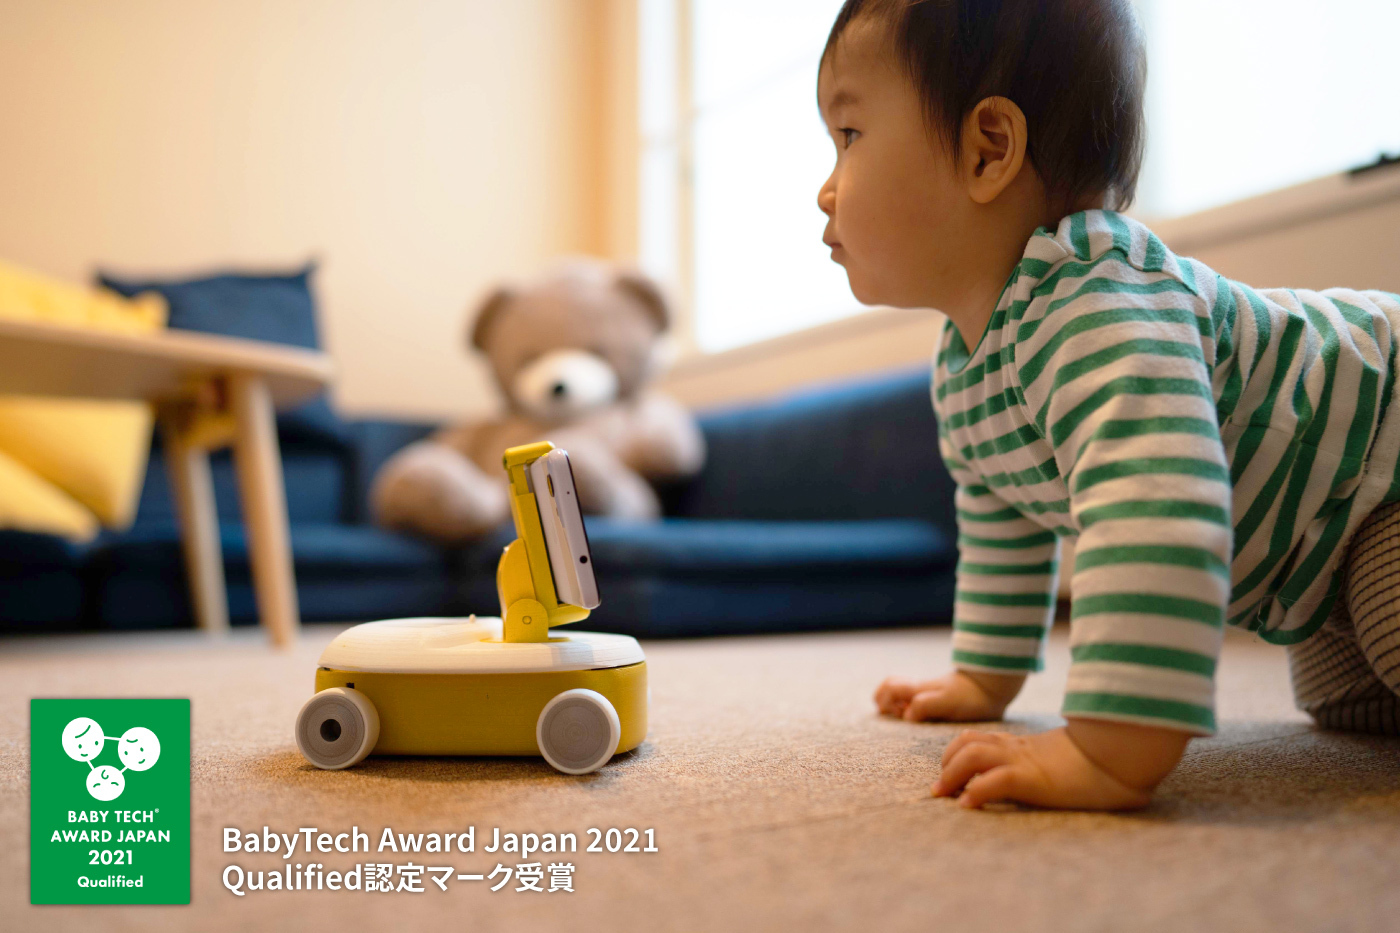 【CreativePocket株式会社】ベビパシャが「BabyTech(R) Award Japan 2021」 認定マークを取得しました!